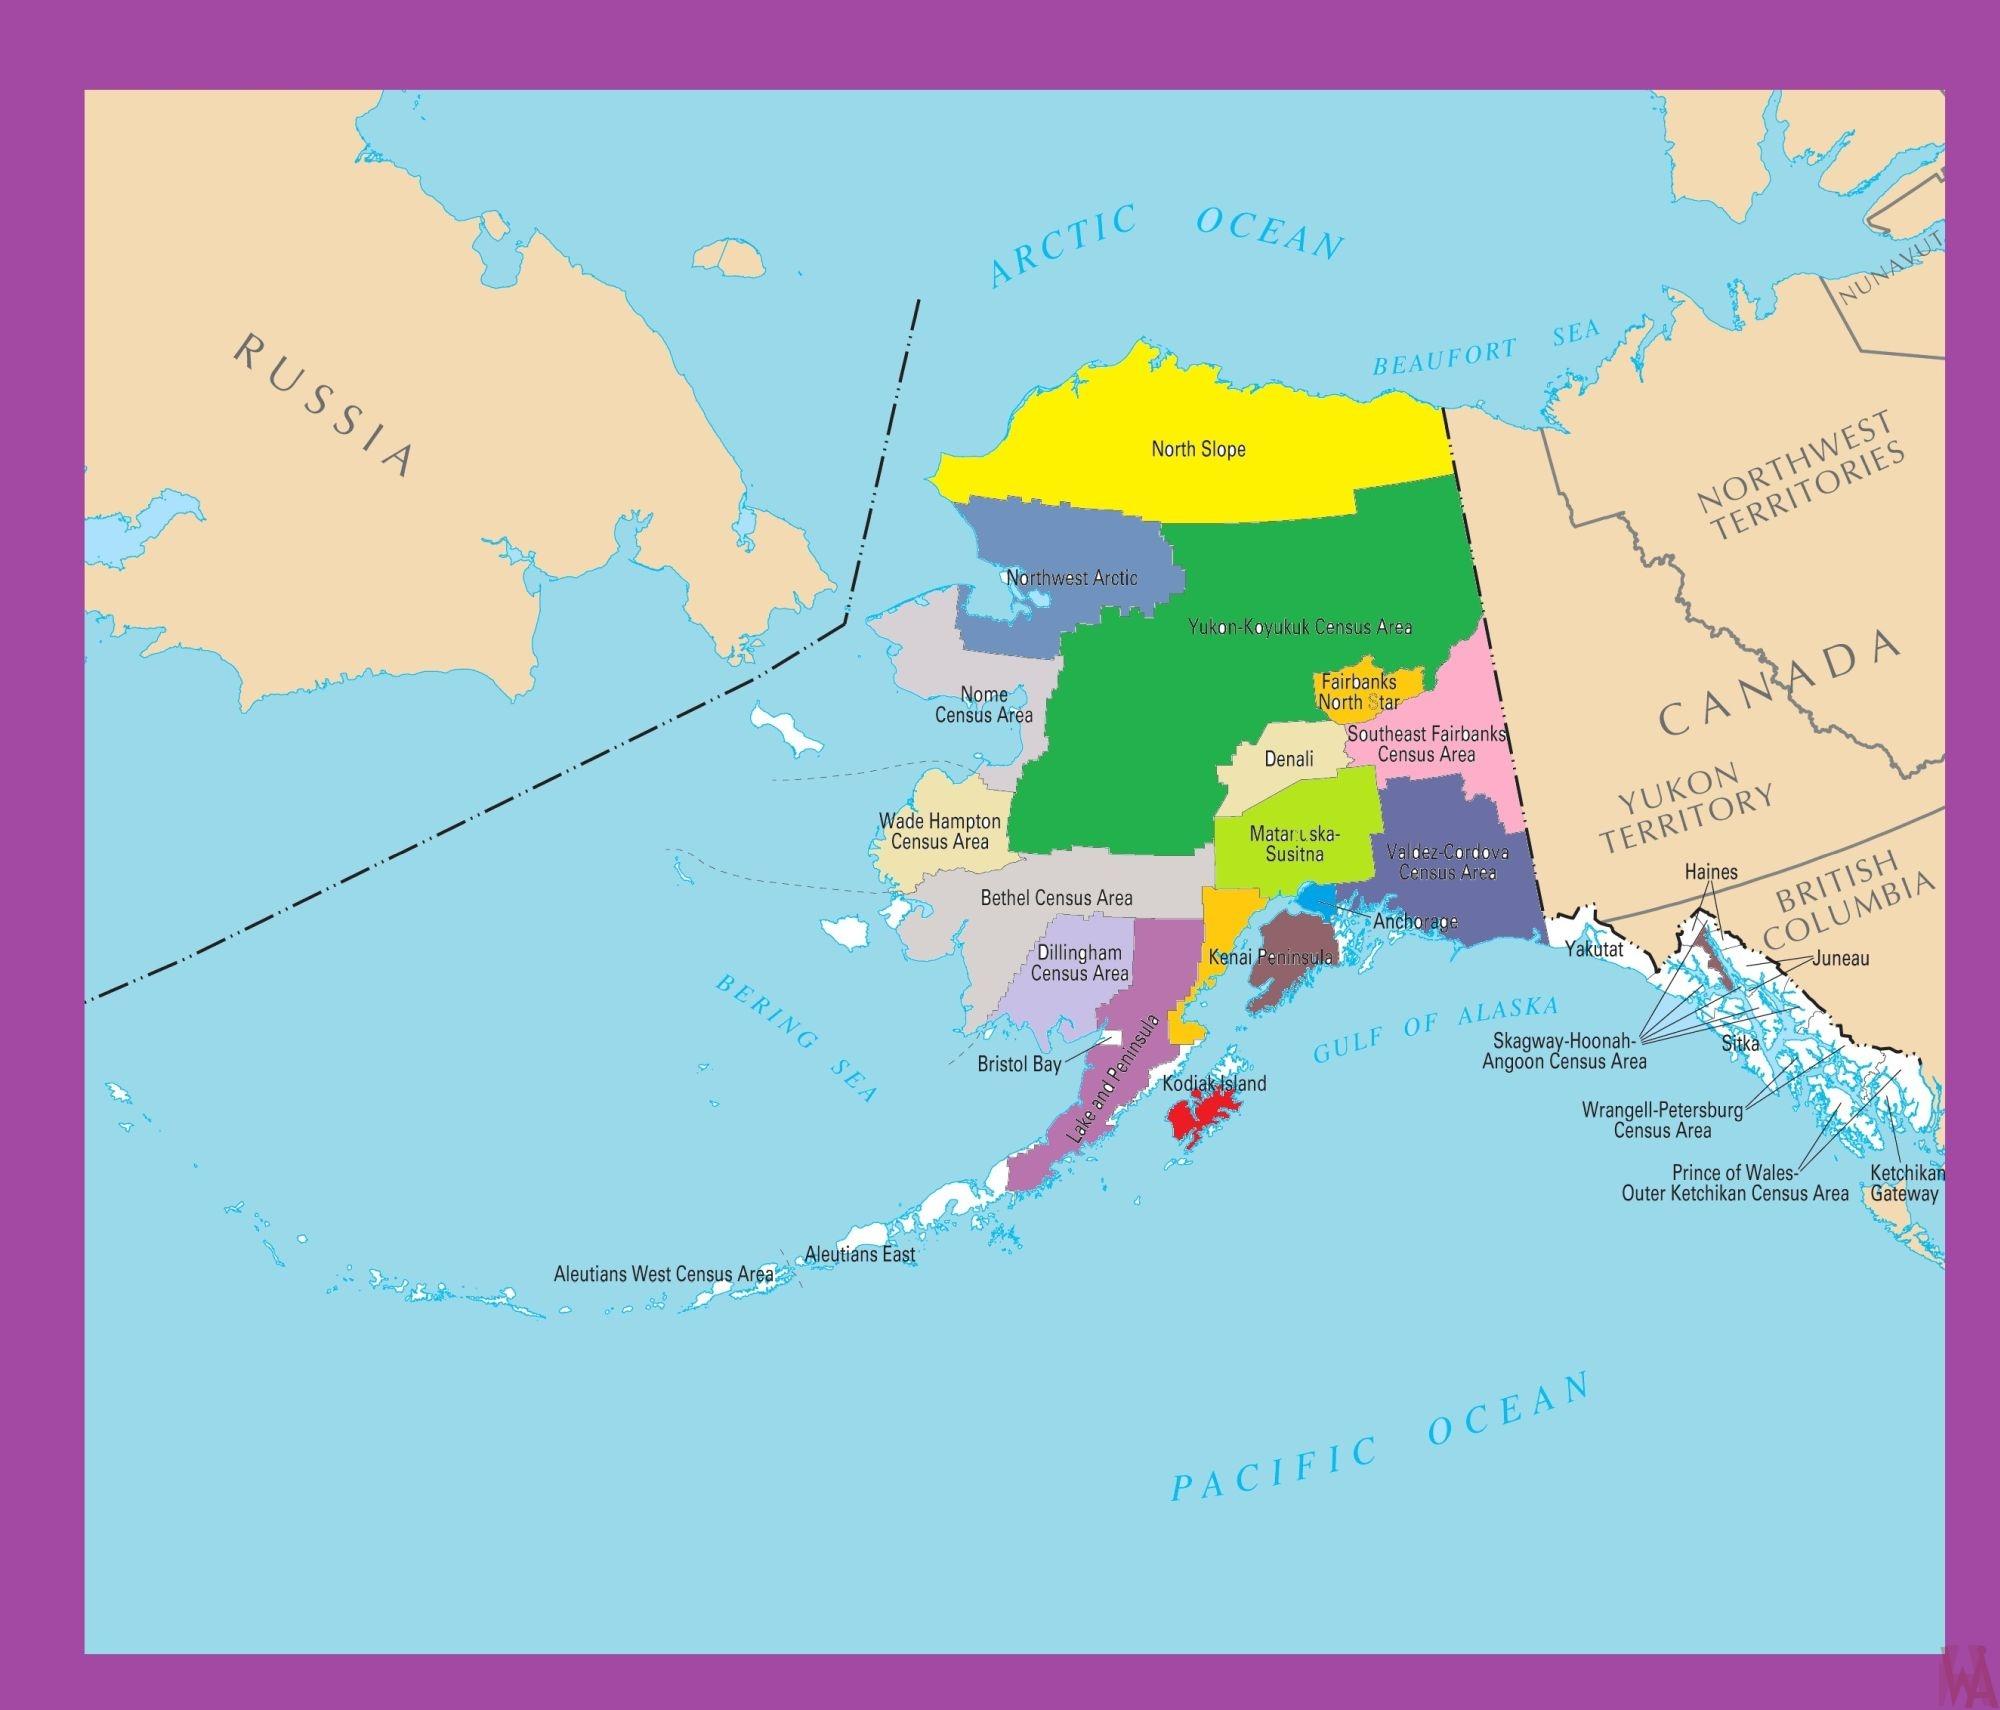 Alaska Color County Map    Color County Map of Alaska -2